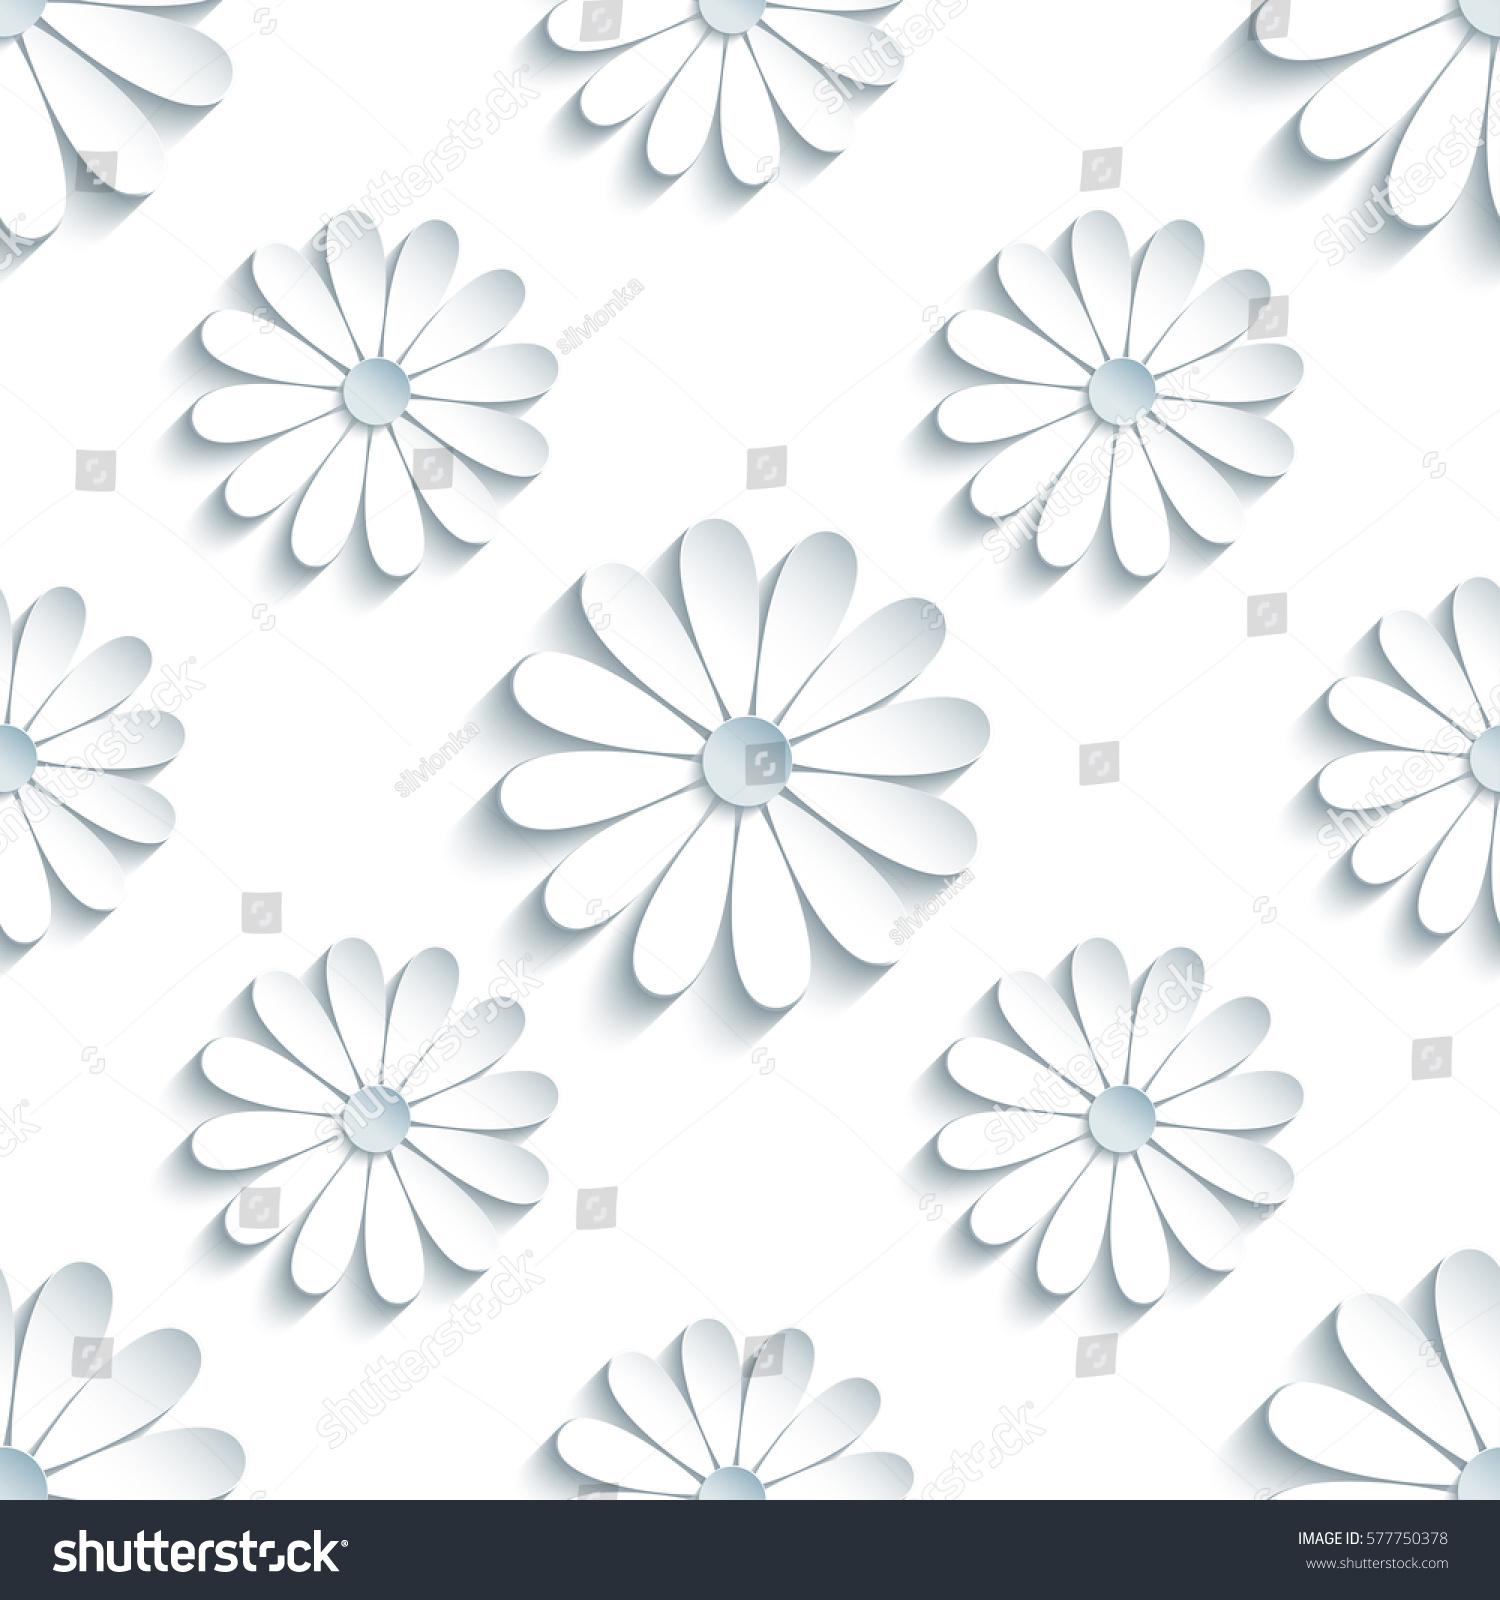 Beautiful modern light background seamless pattern stock for 3d white flower wallpaper